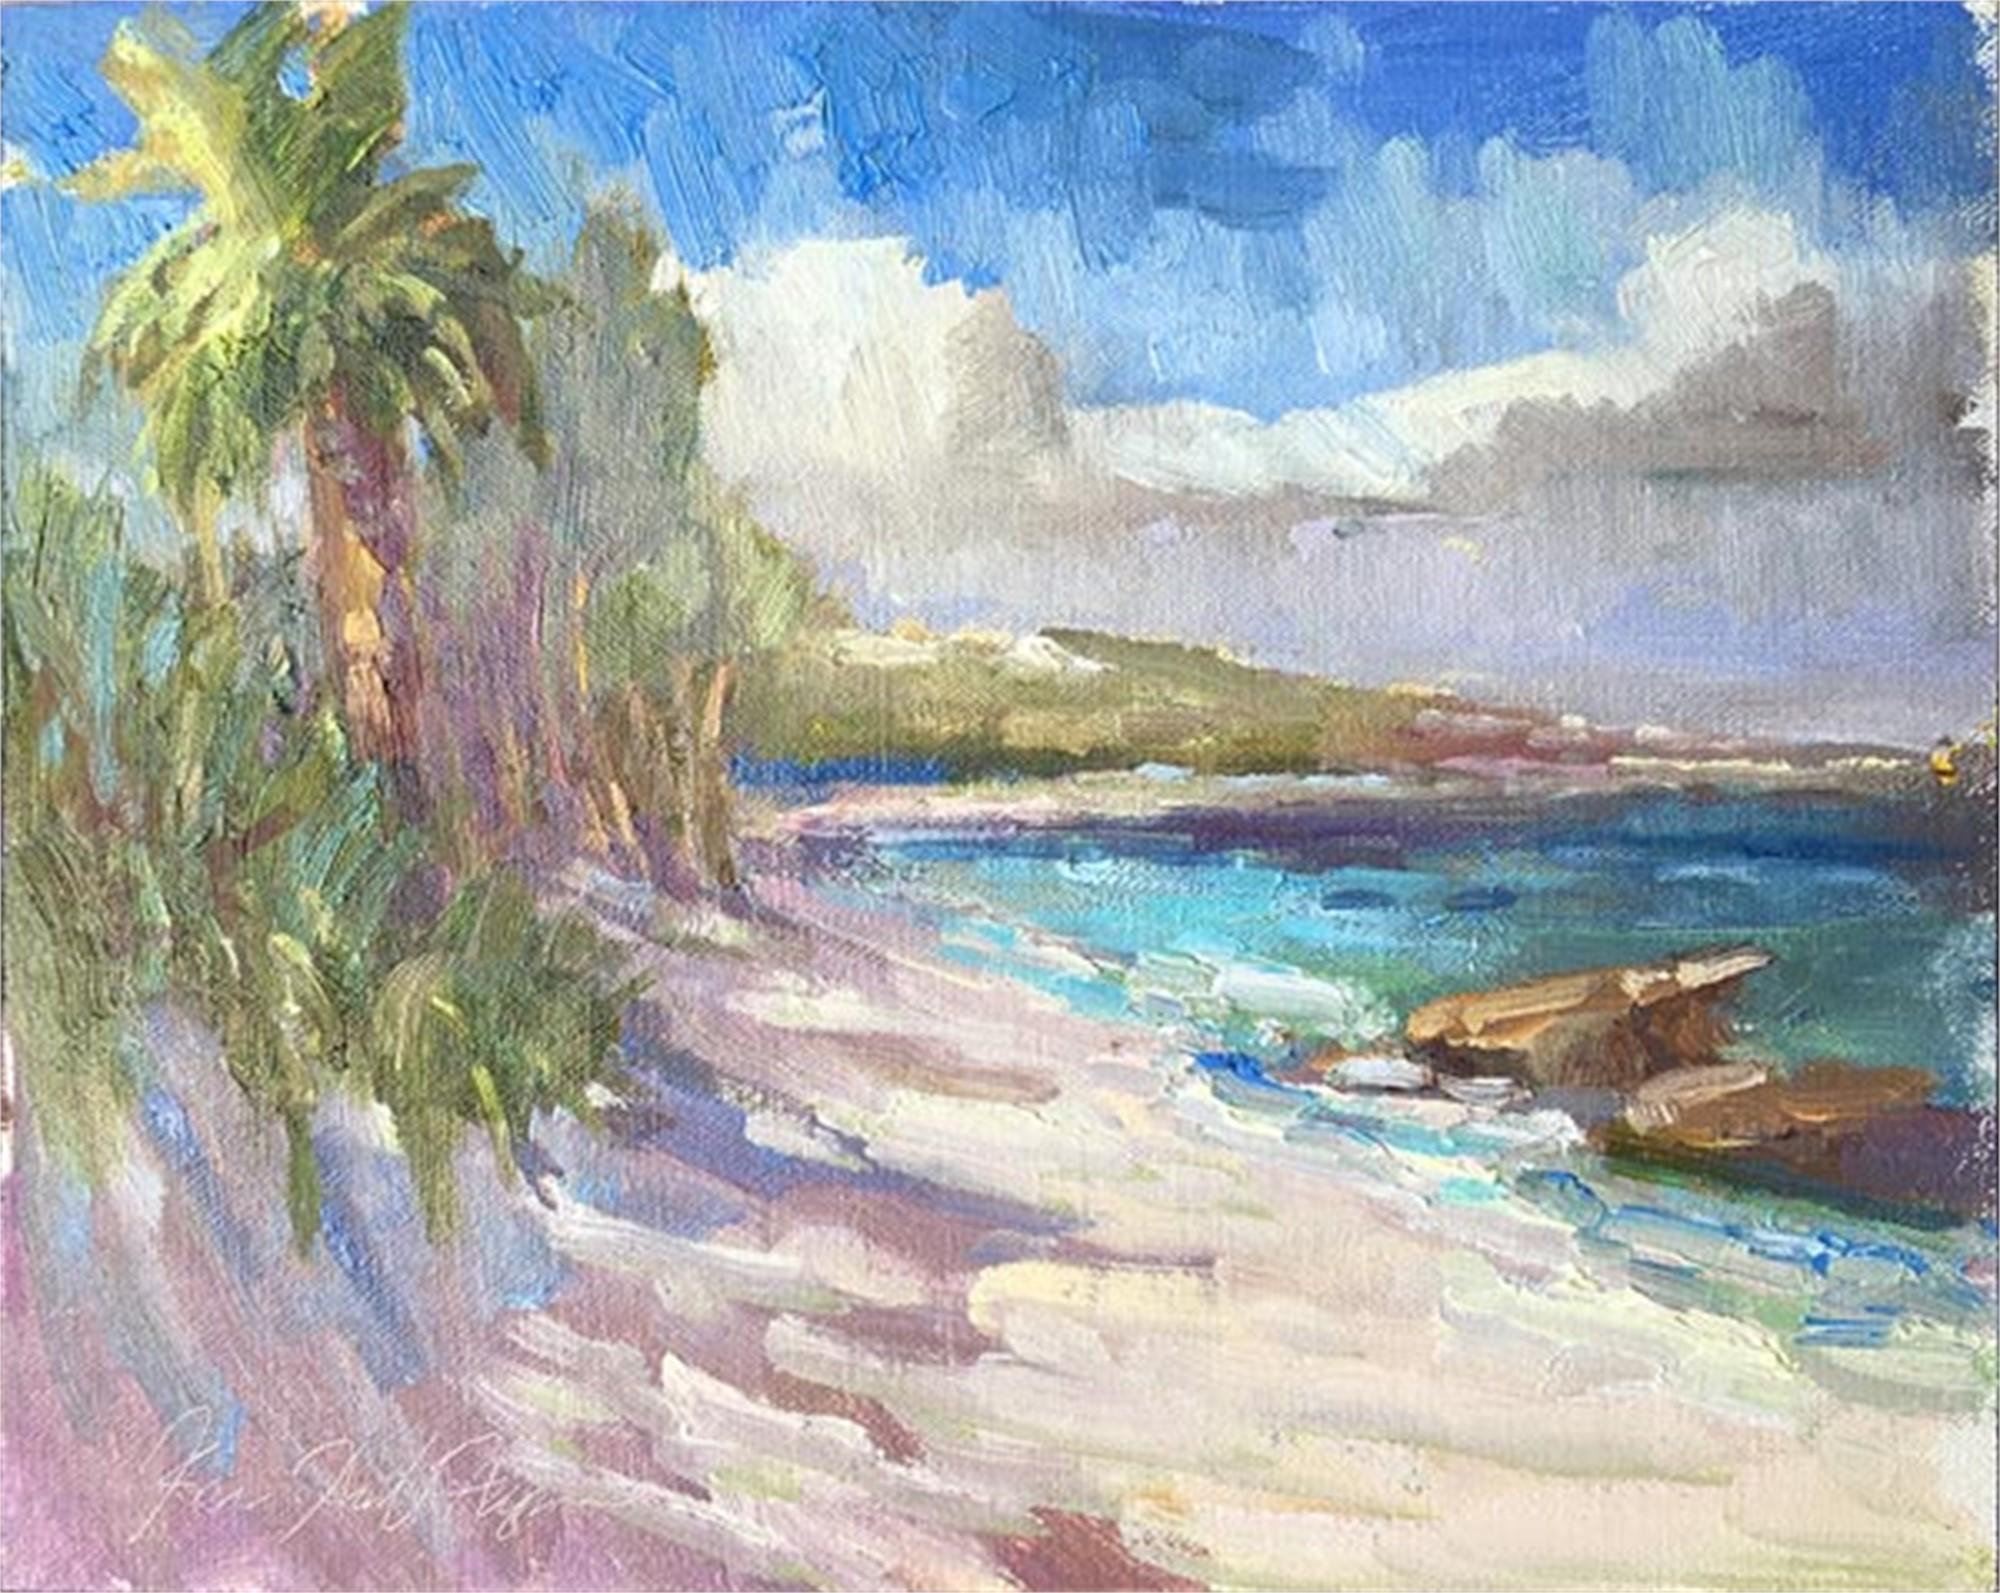 The Beach at Nippers by Karen Hewitt Hagan